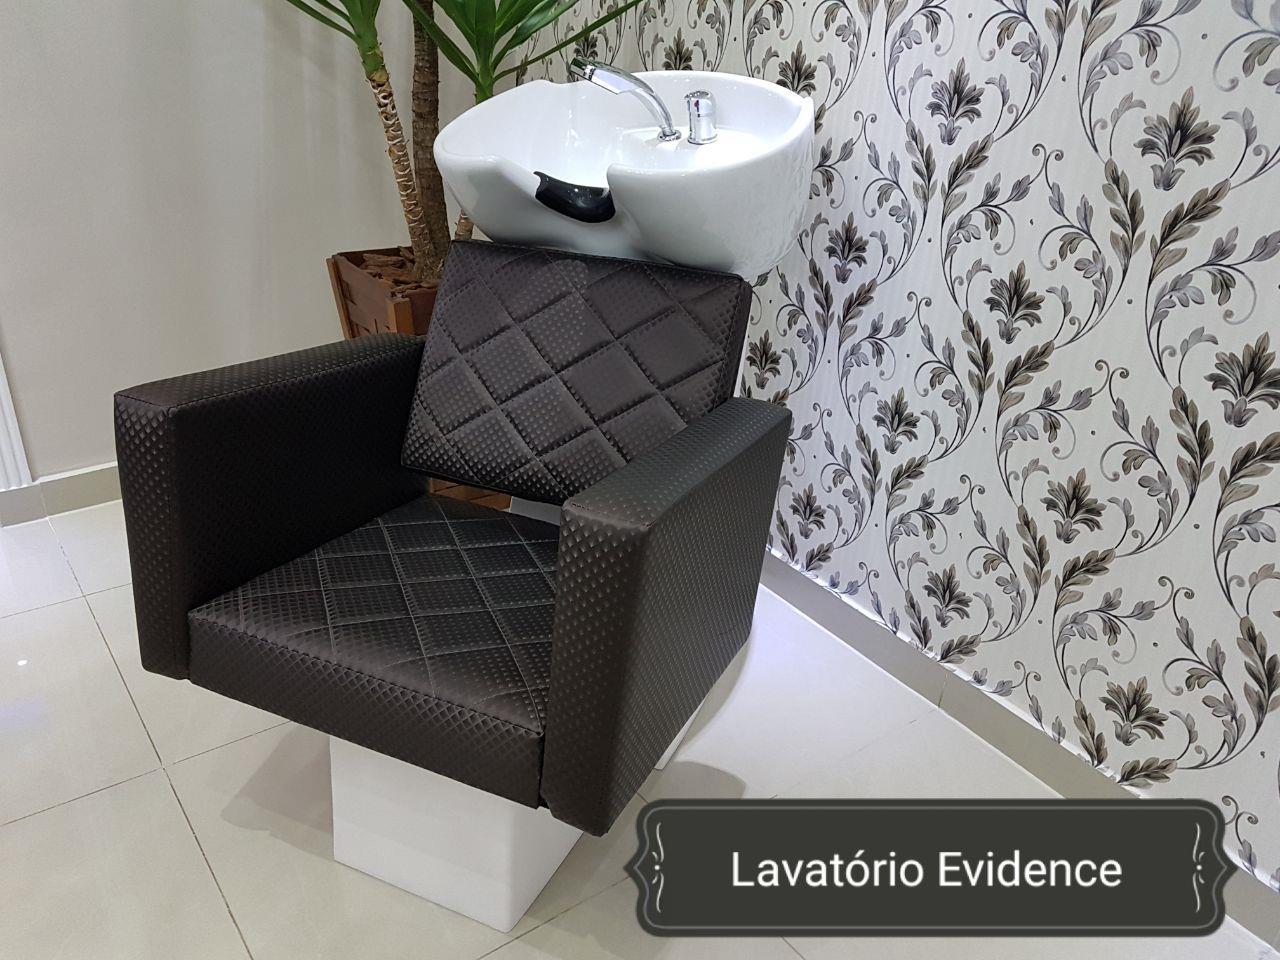 Lavatório Evidence Cuba Porcelana - Bullon Marrom Blind